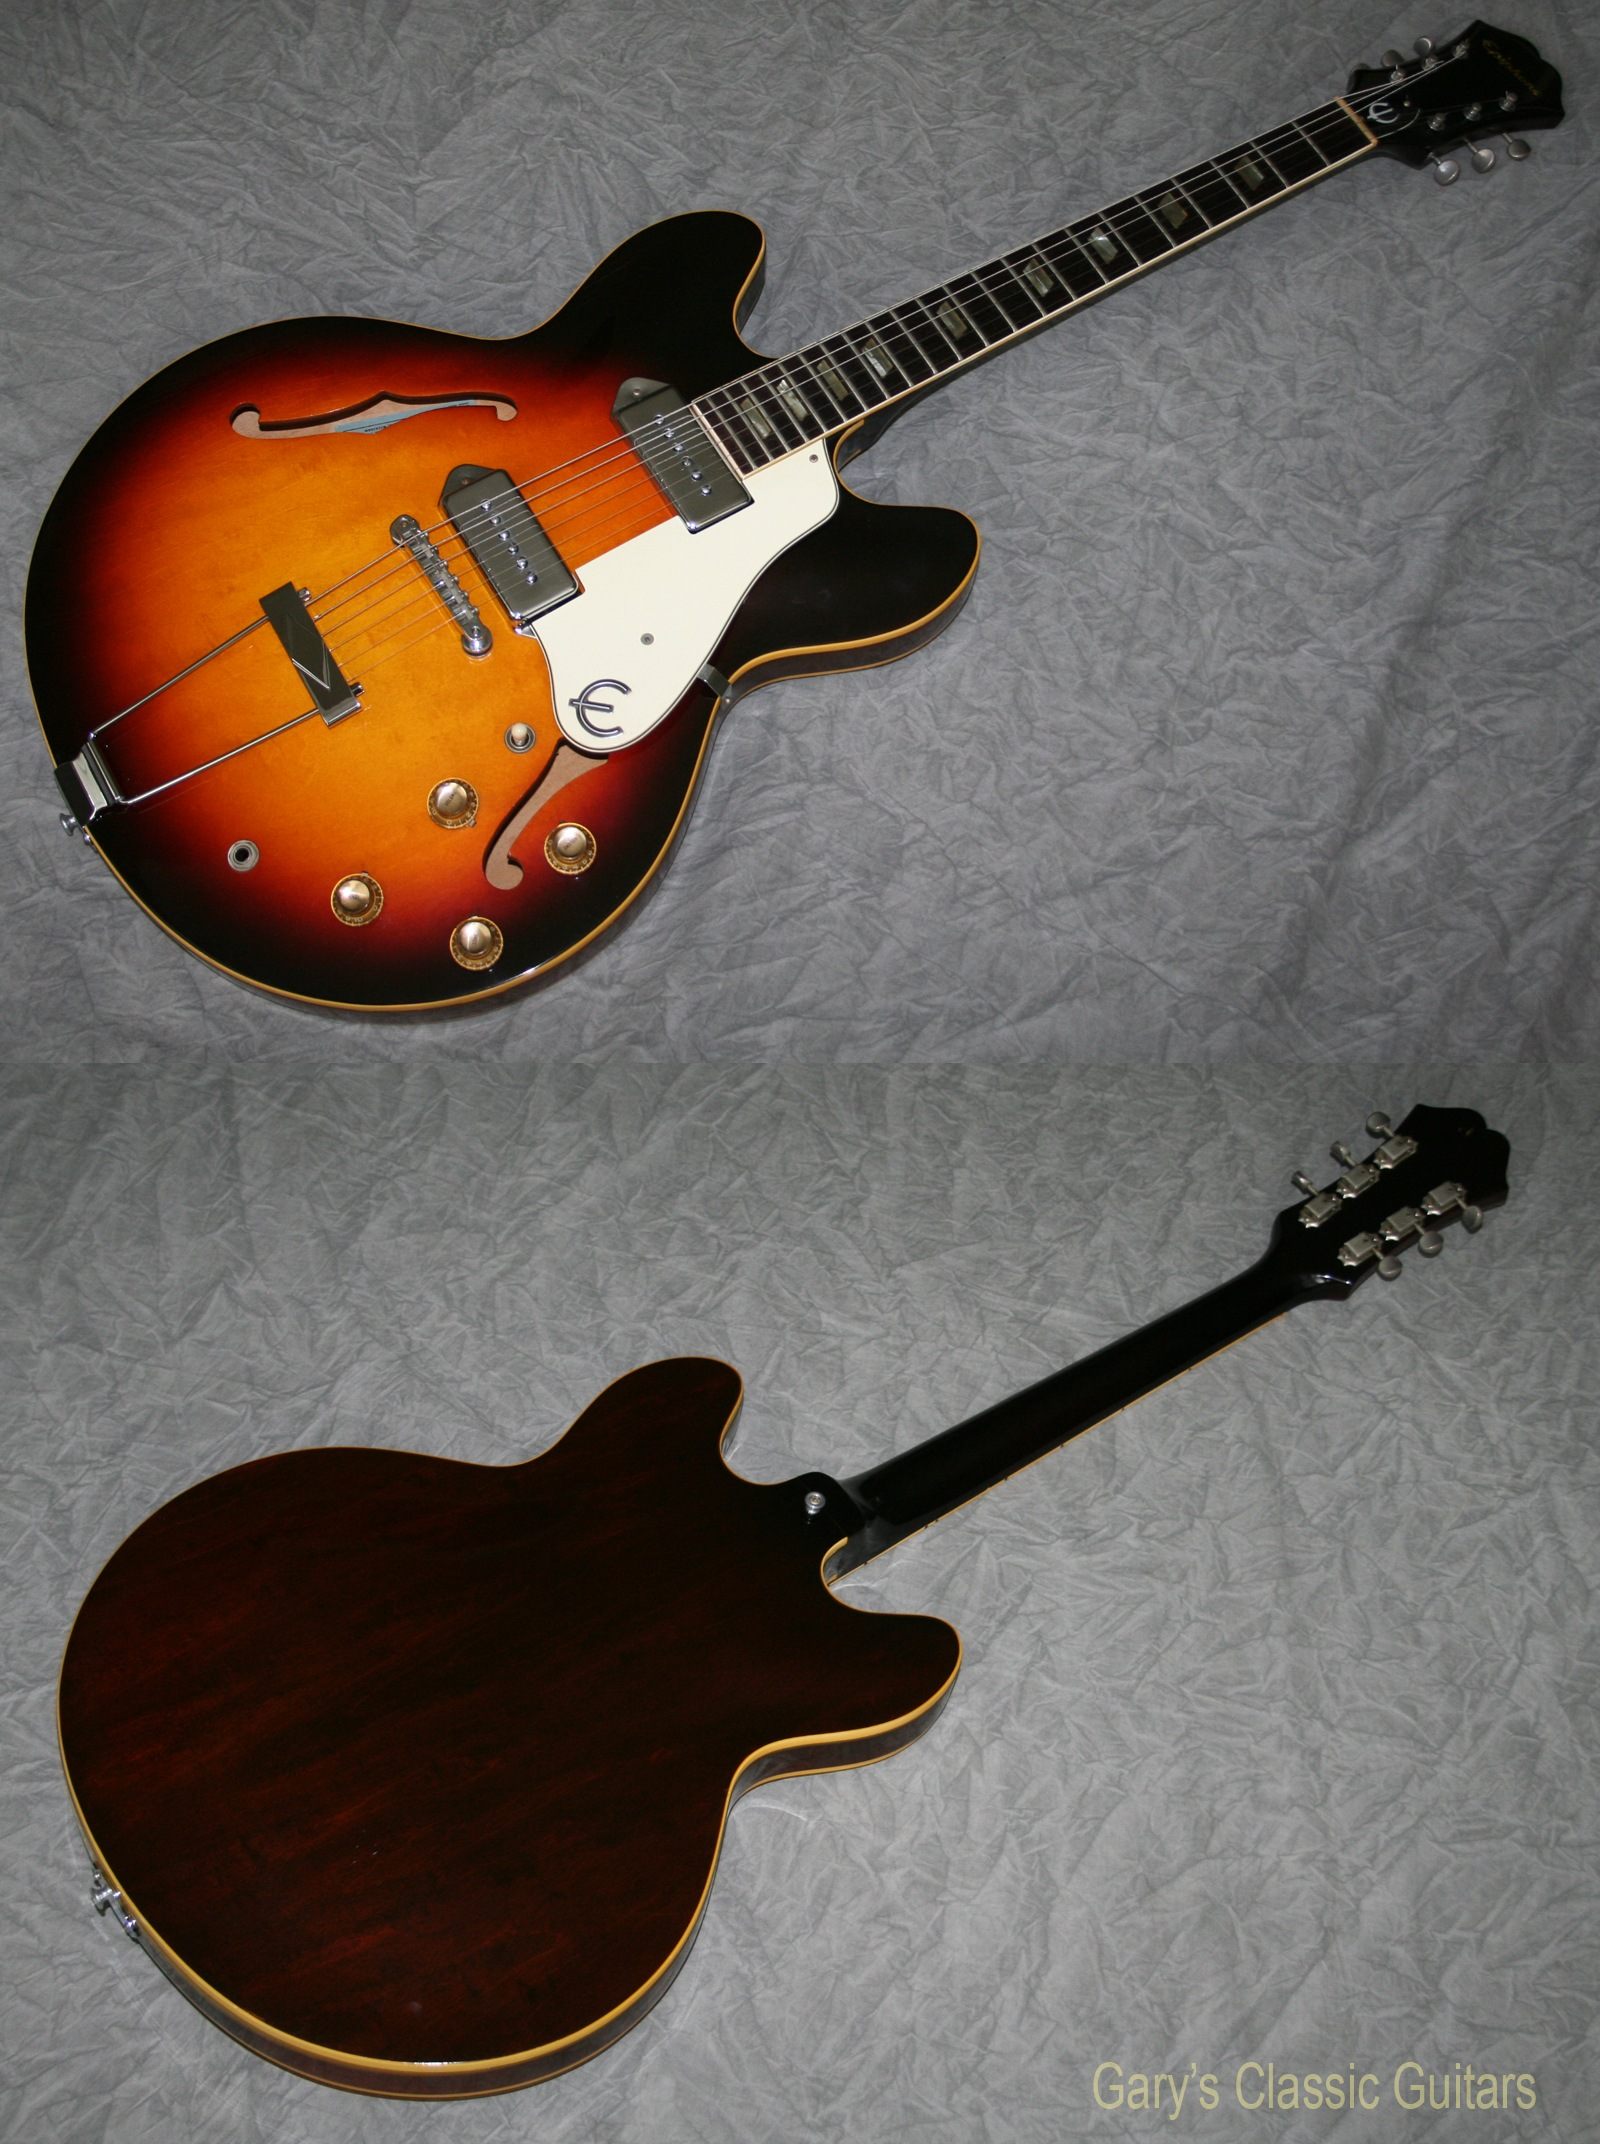 1967 Epiphone Casino | Garys Classic Guitars & Vintage